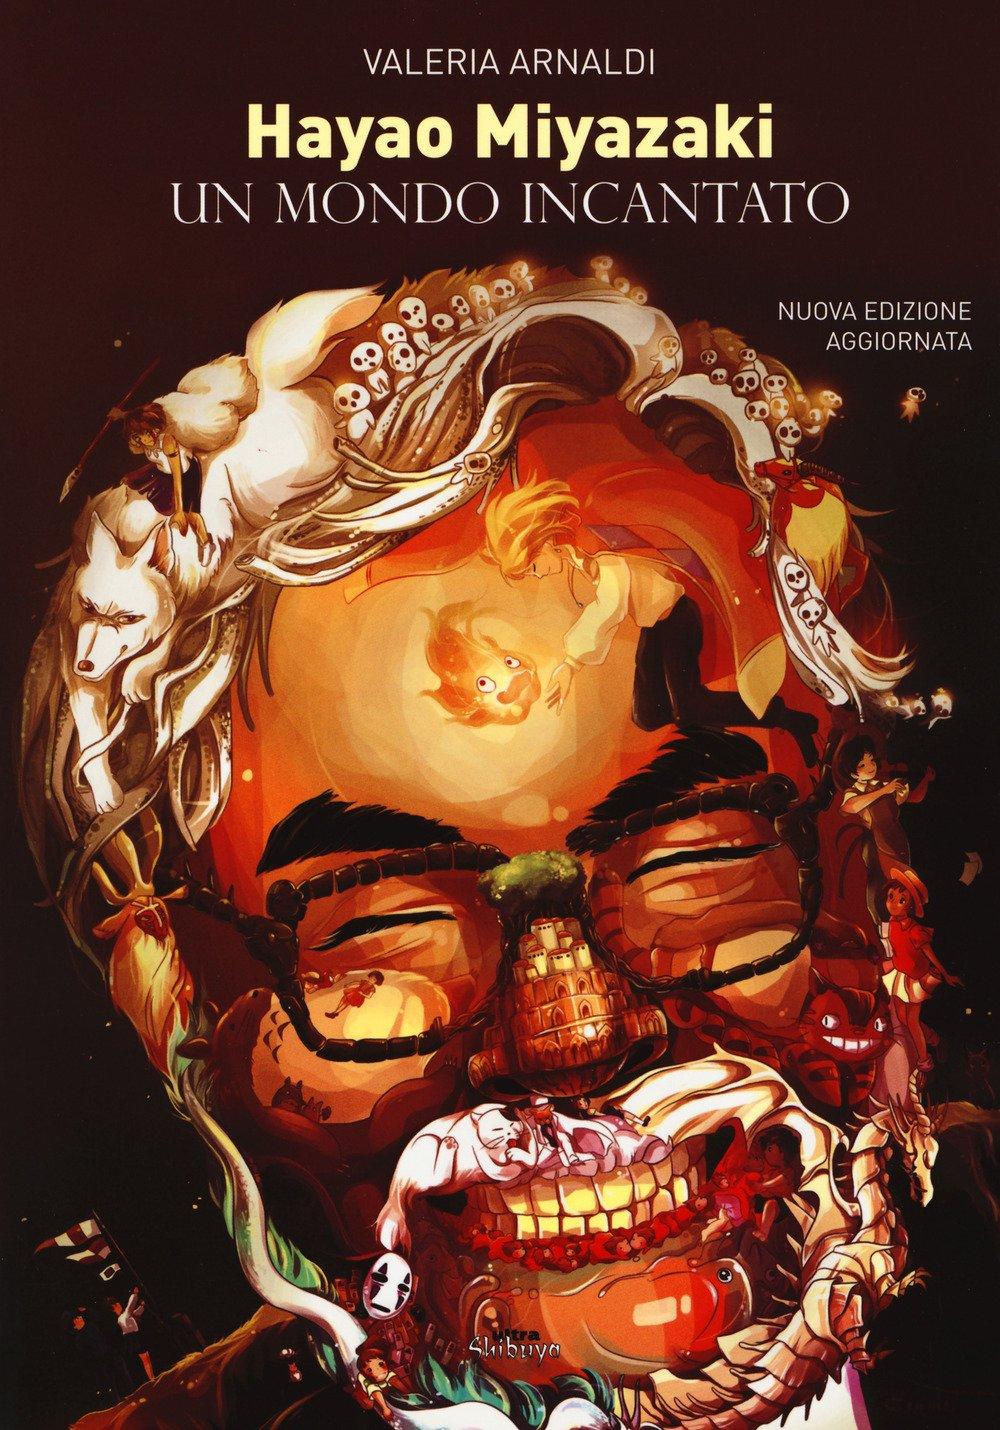 Hayao Miyazaki. Un mondo incantato Copertina flessibile – 25 mag 2017 Valeria Arnaldi Ultra 8867766082 Altra non illustrata